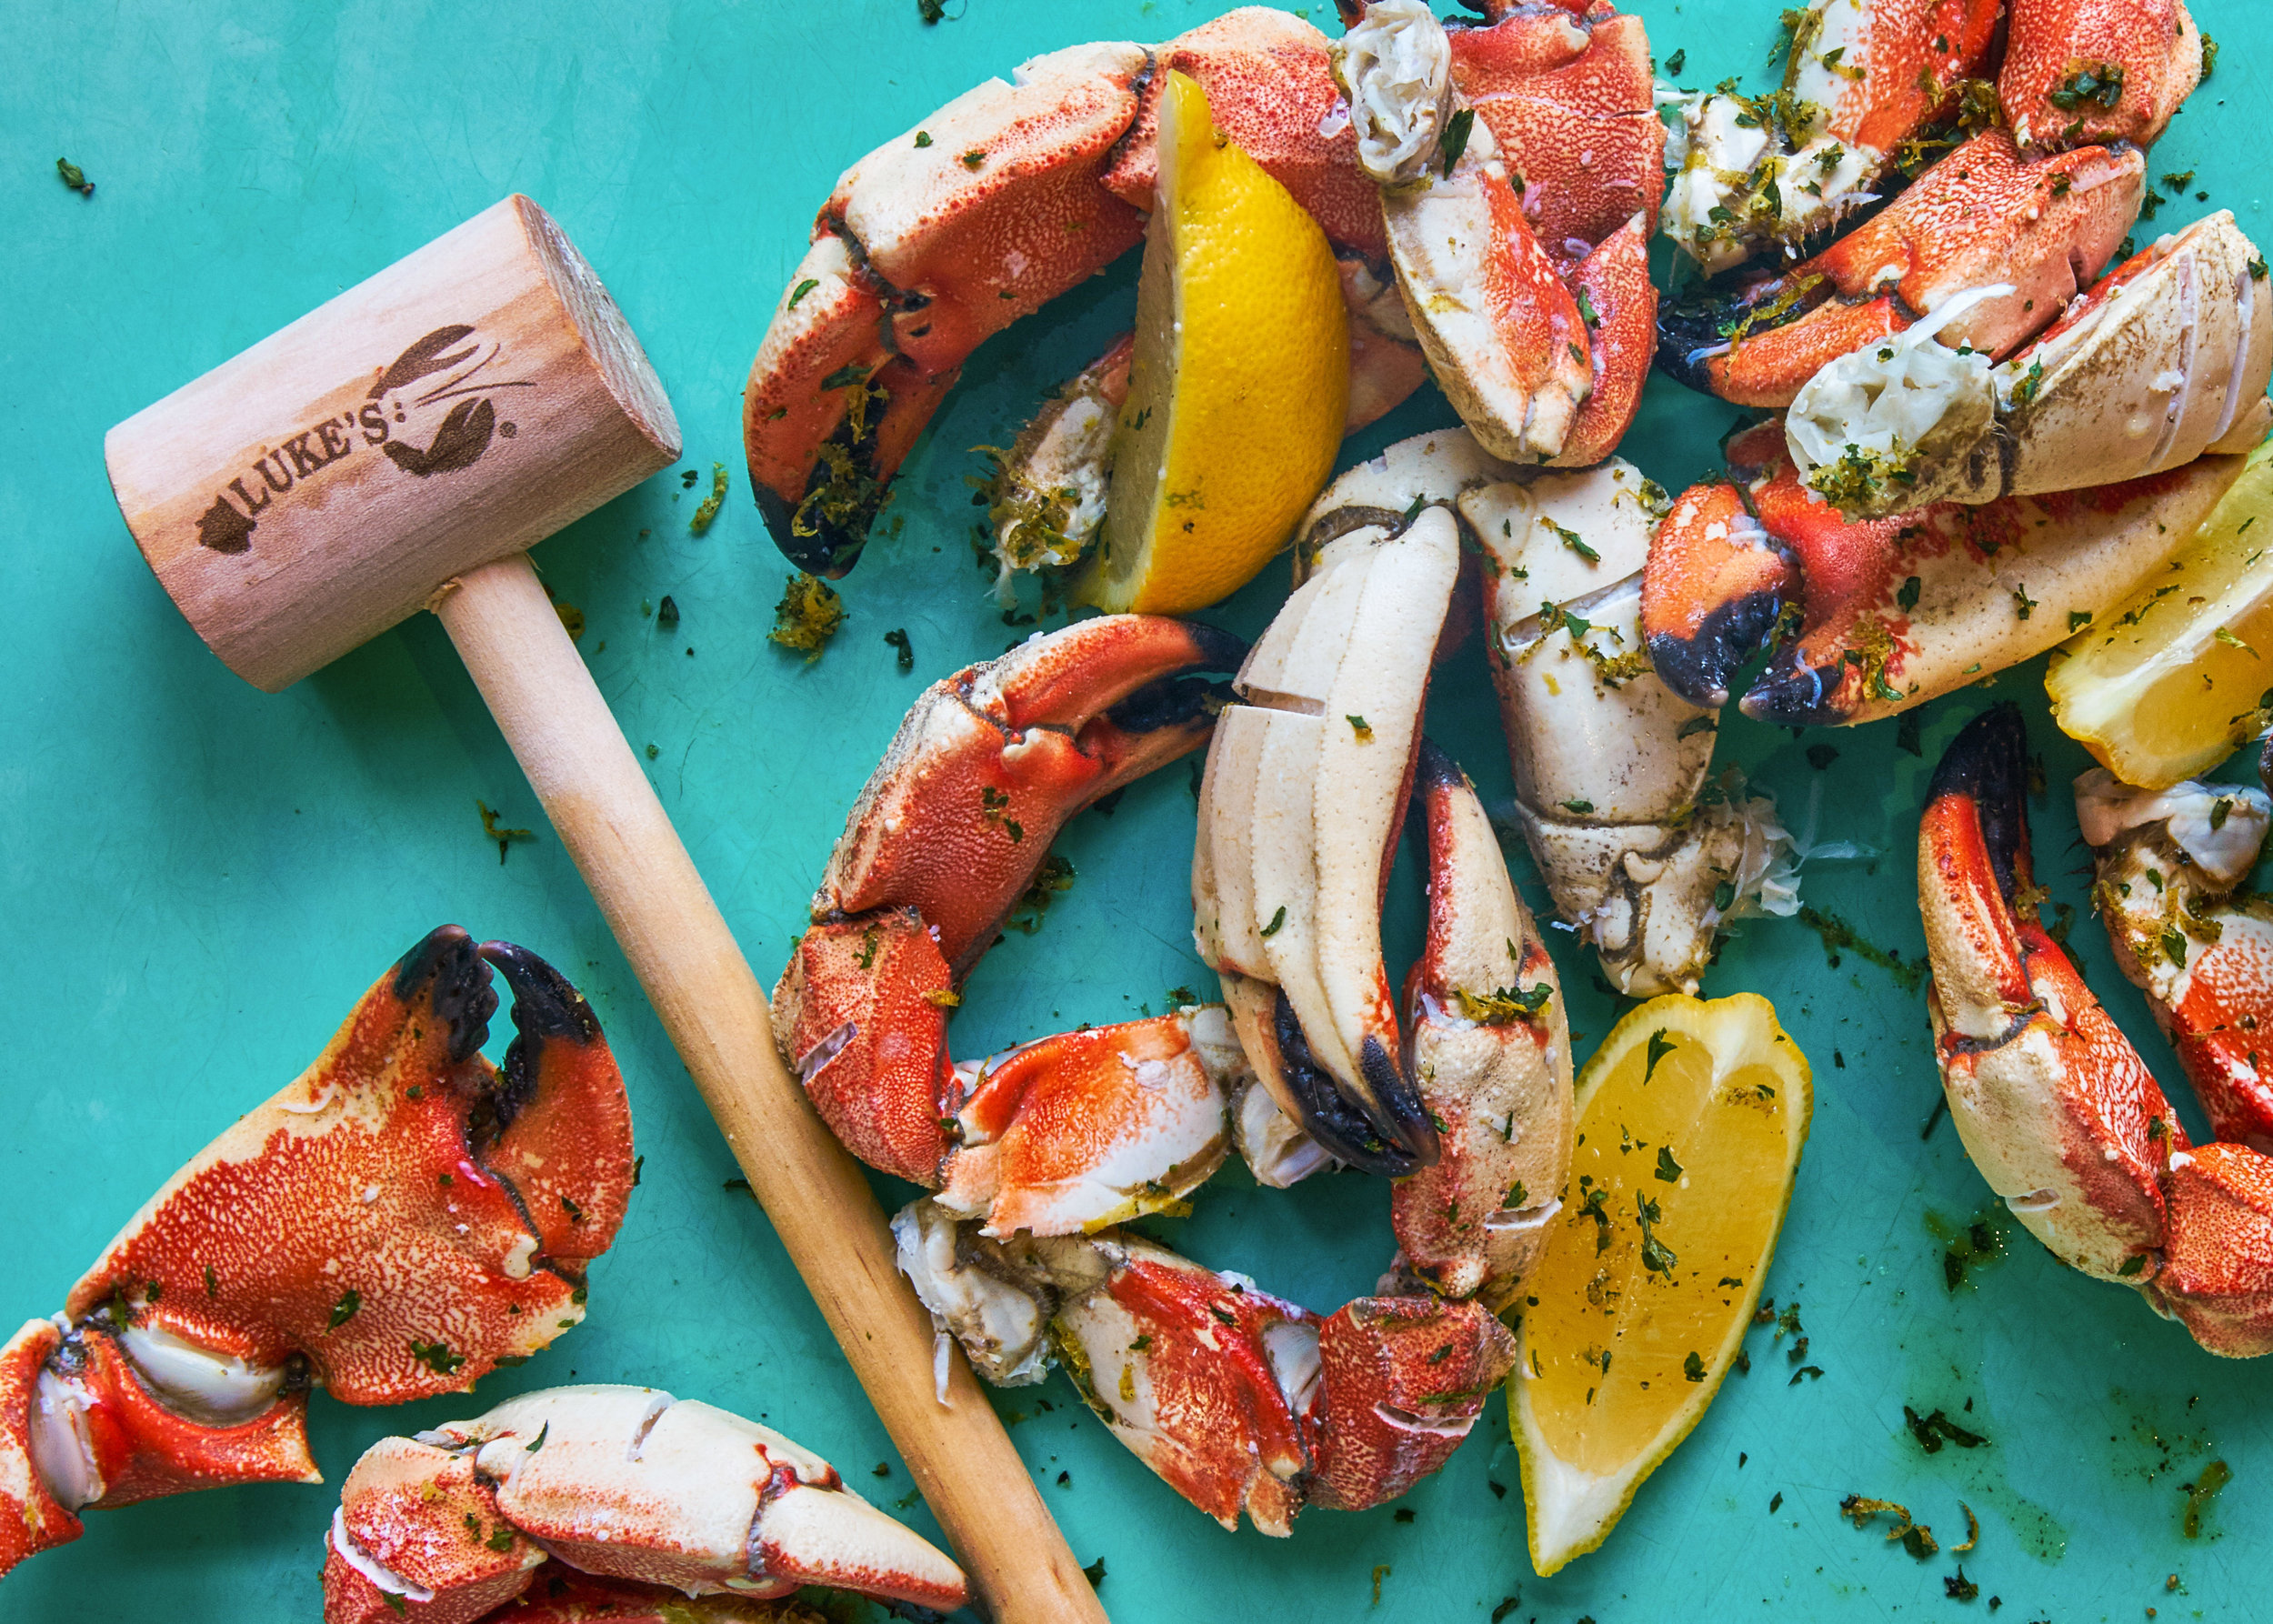 PIXELLAB_Lukes Lobster-70.jpg